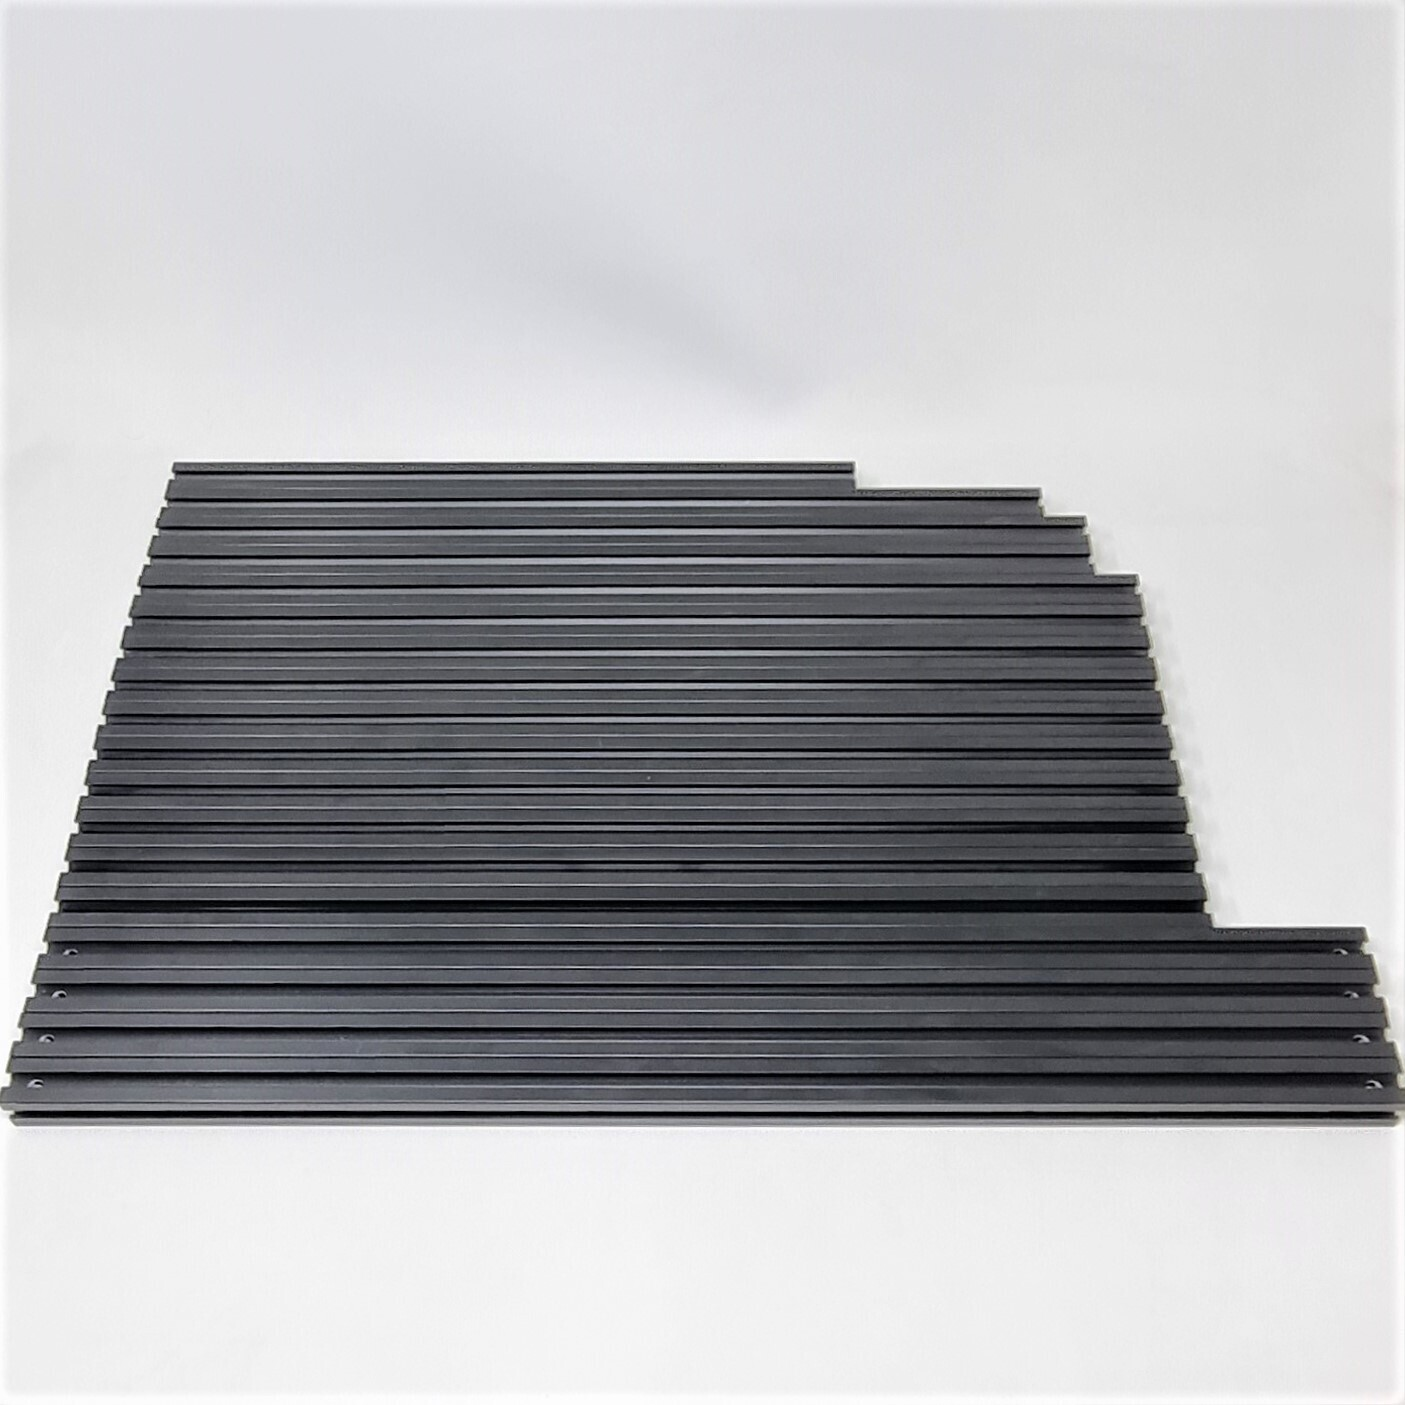 Misumi T Slot Set for Voron 2.4 (350mm, BLACK Anodized)